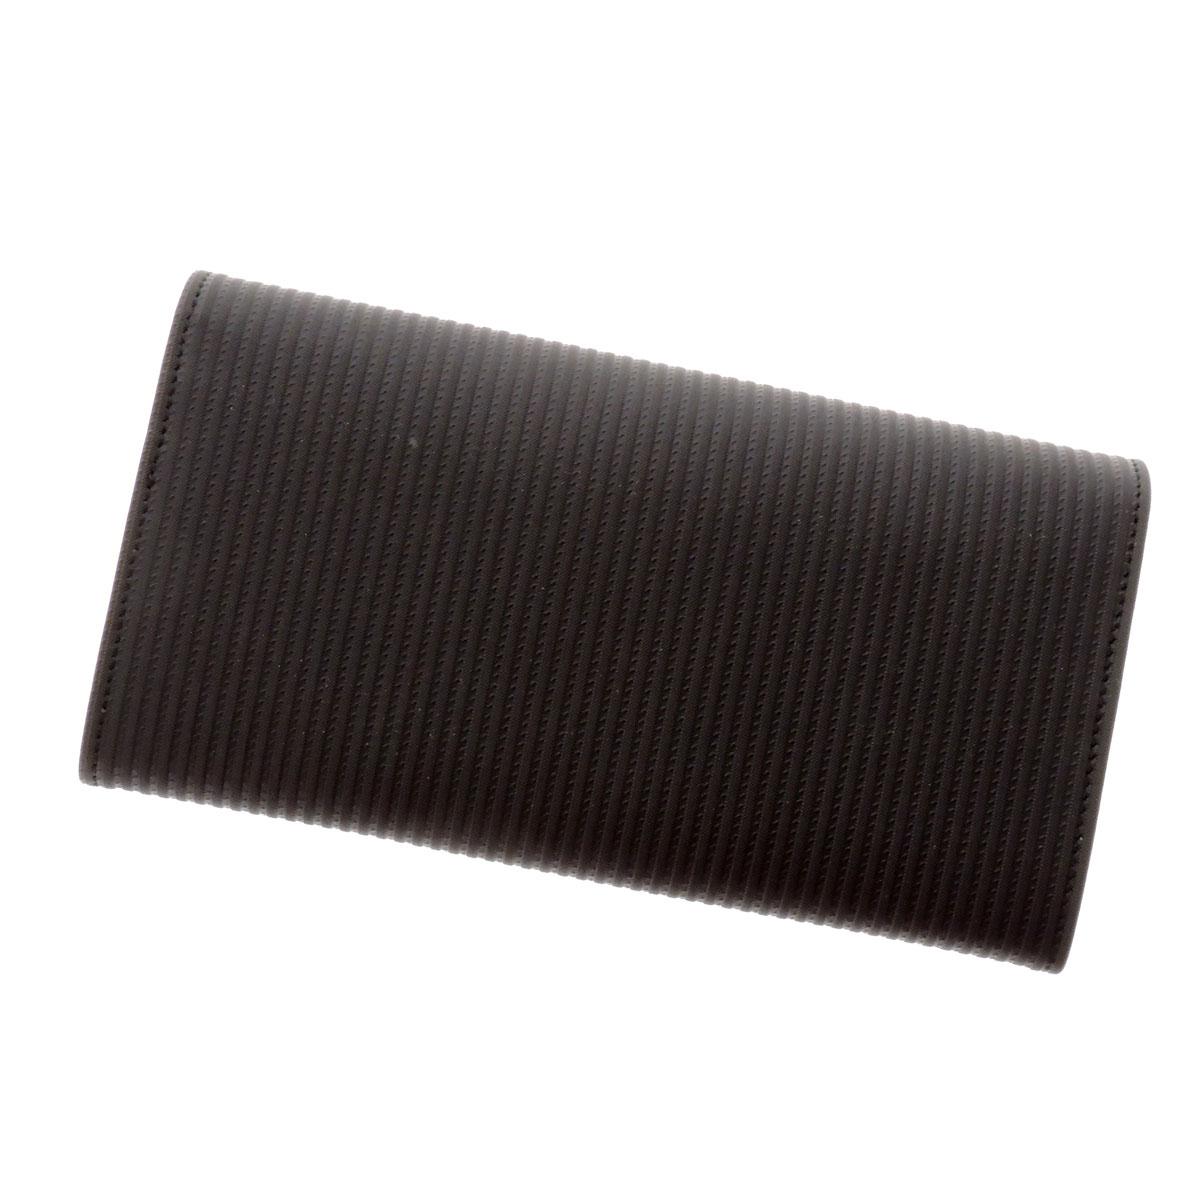 BVLGARI slim wallet ( purses and ) PVC x leather unisex